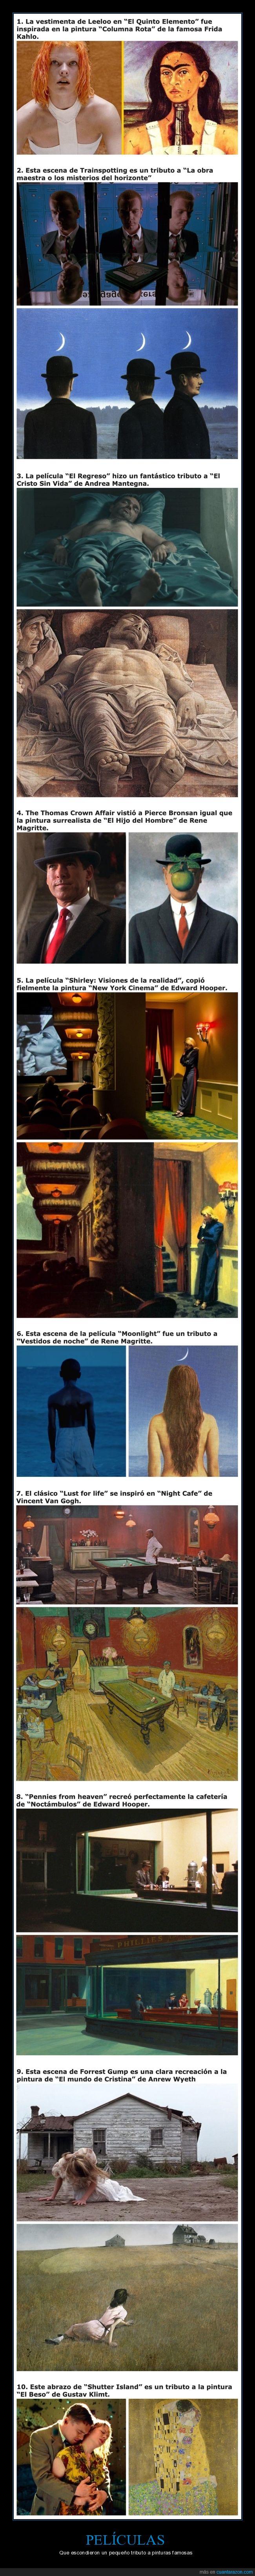 arte,cuadros,películas,pinturas,tributos